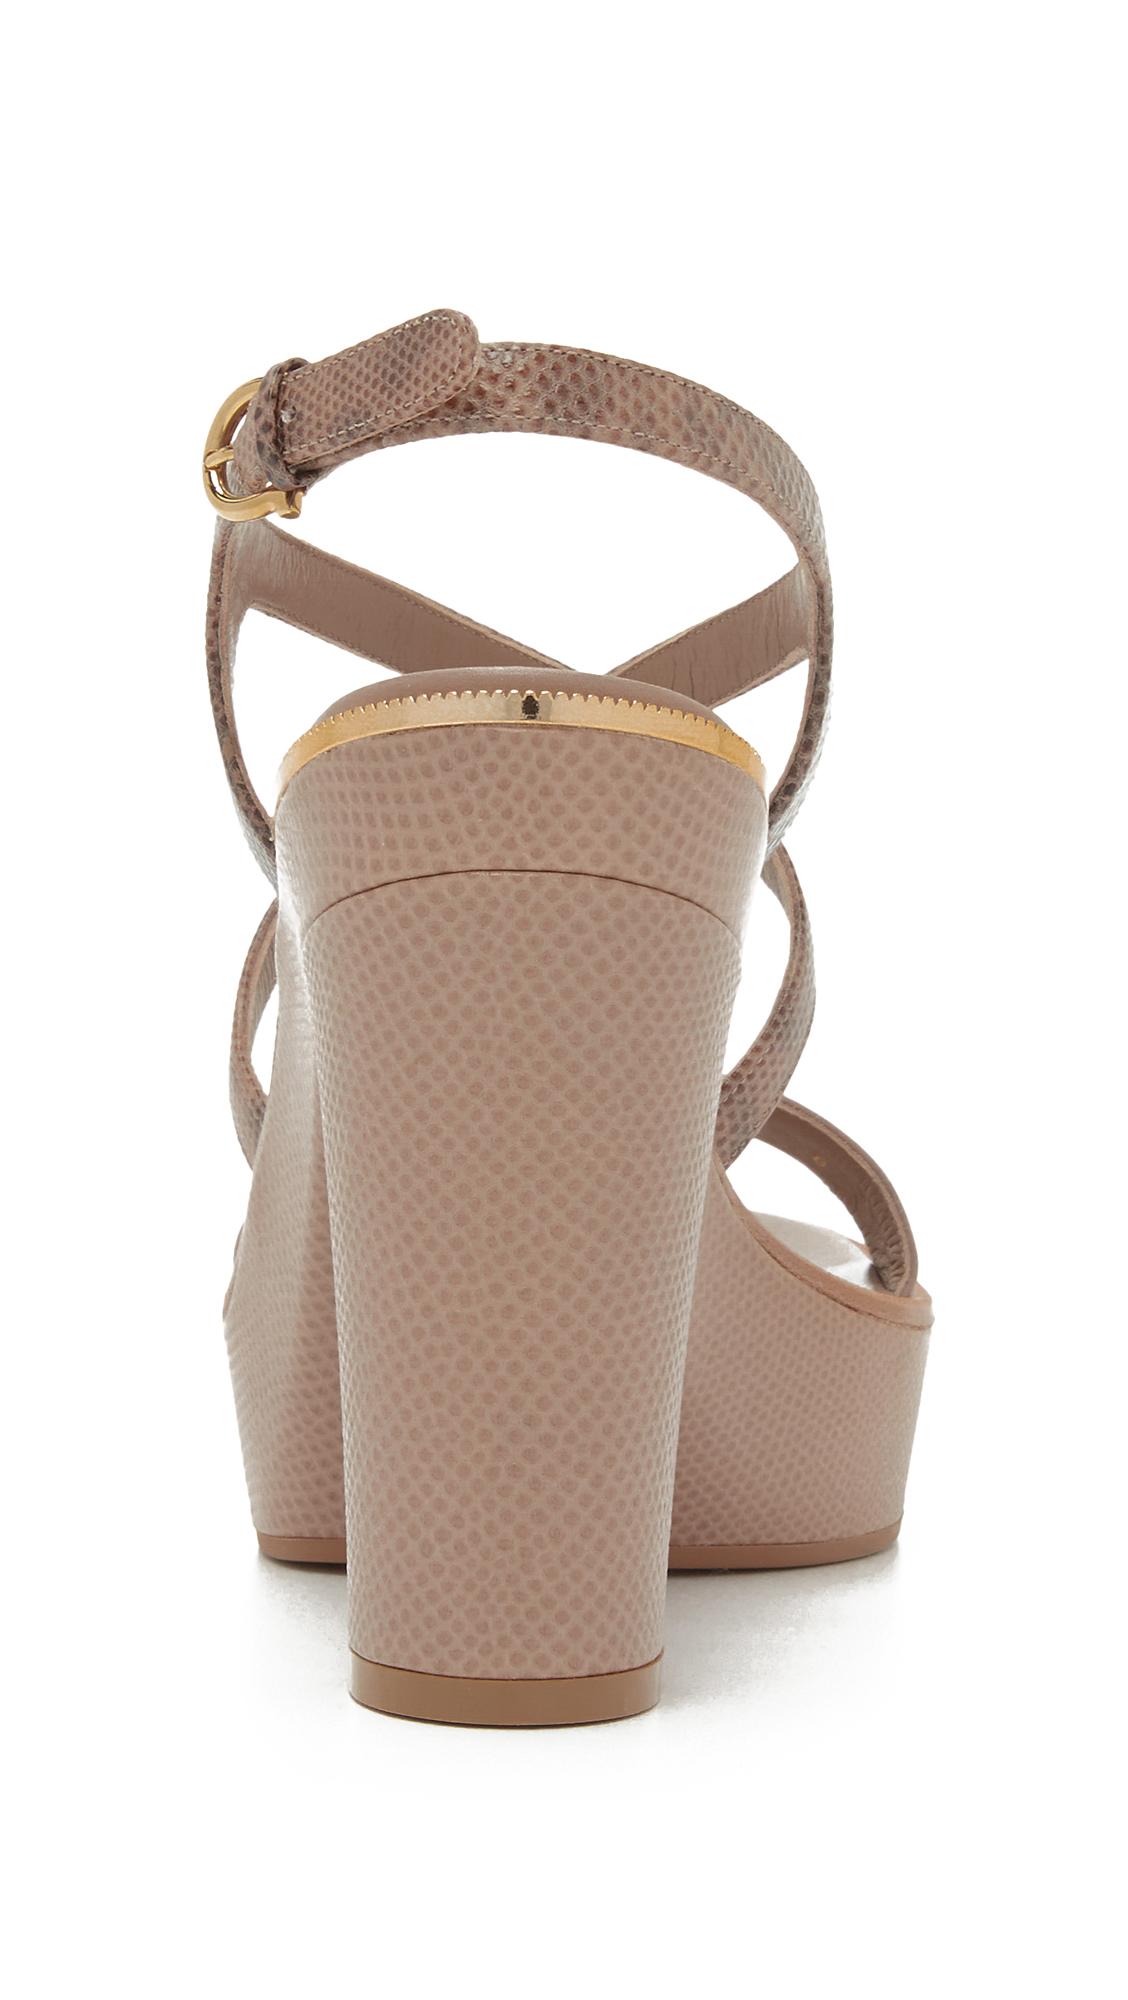 b0b4f76340e6 Salvatore Ferragamo Gina Platform Sandals